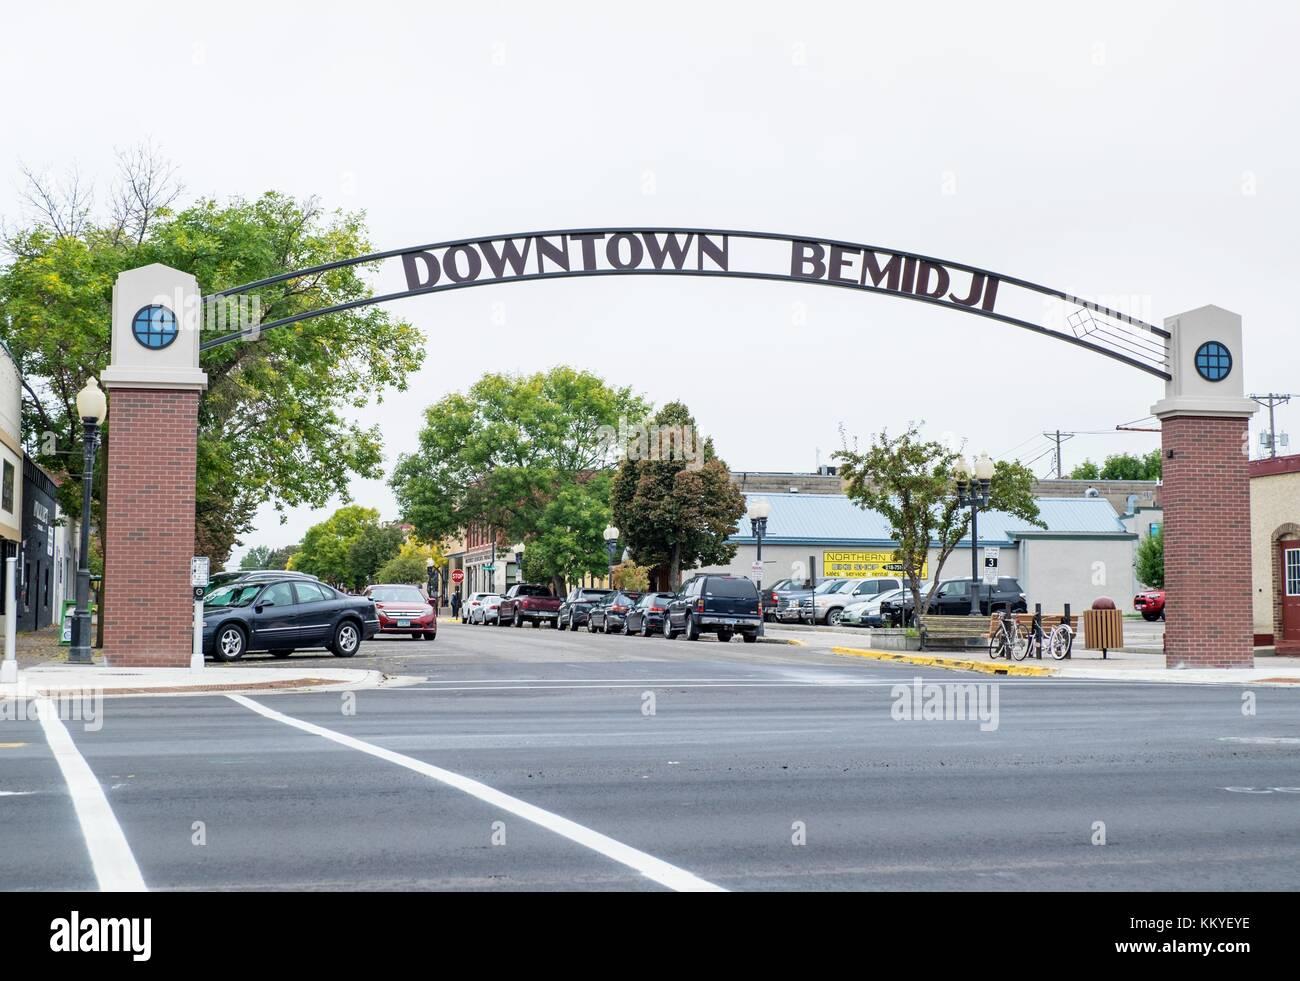 Gateway To Downtown Bemidji Minnesota Usa Stock Photo